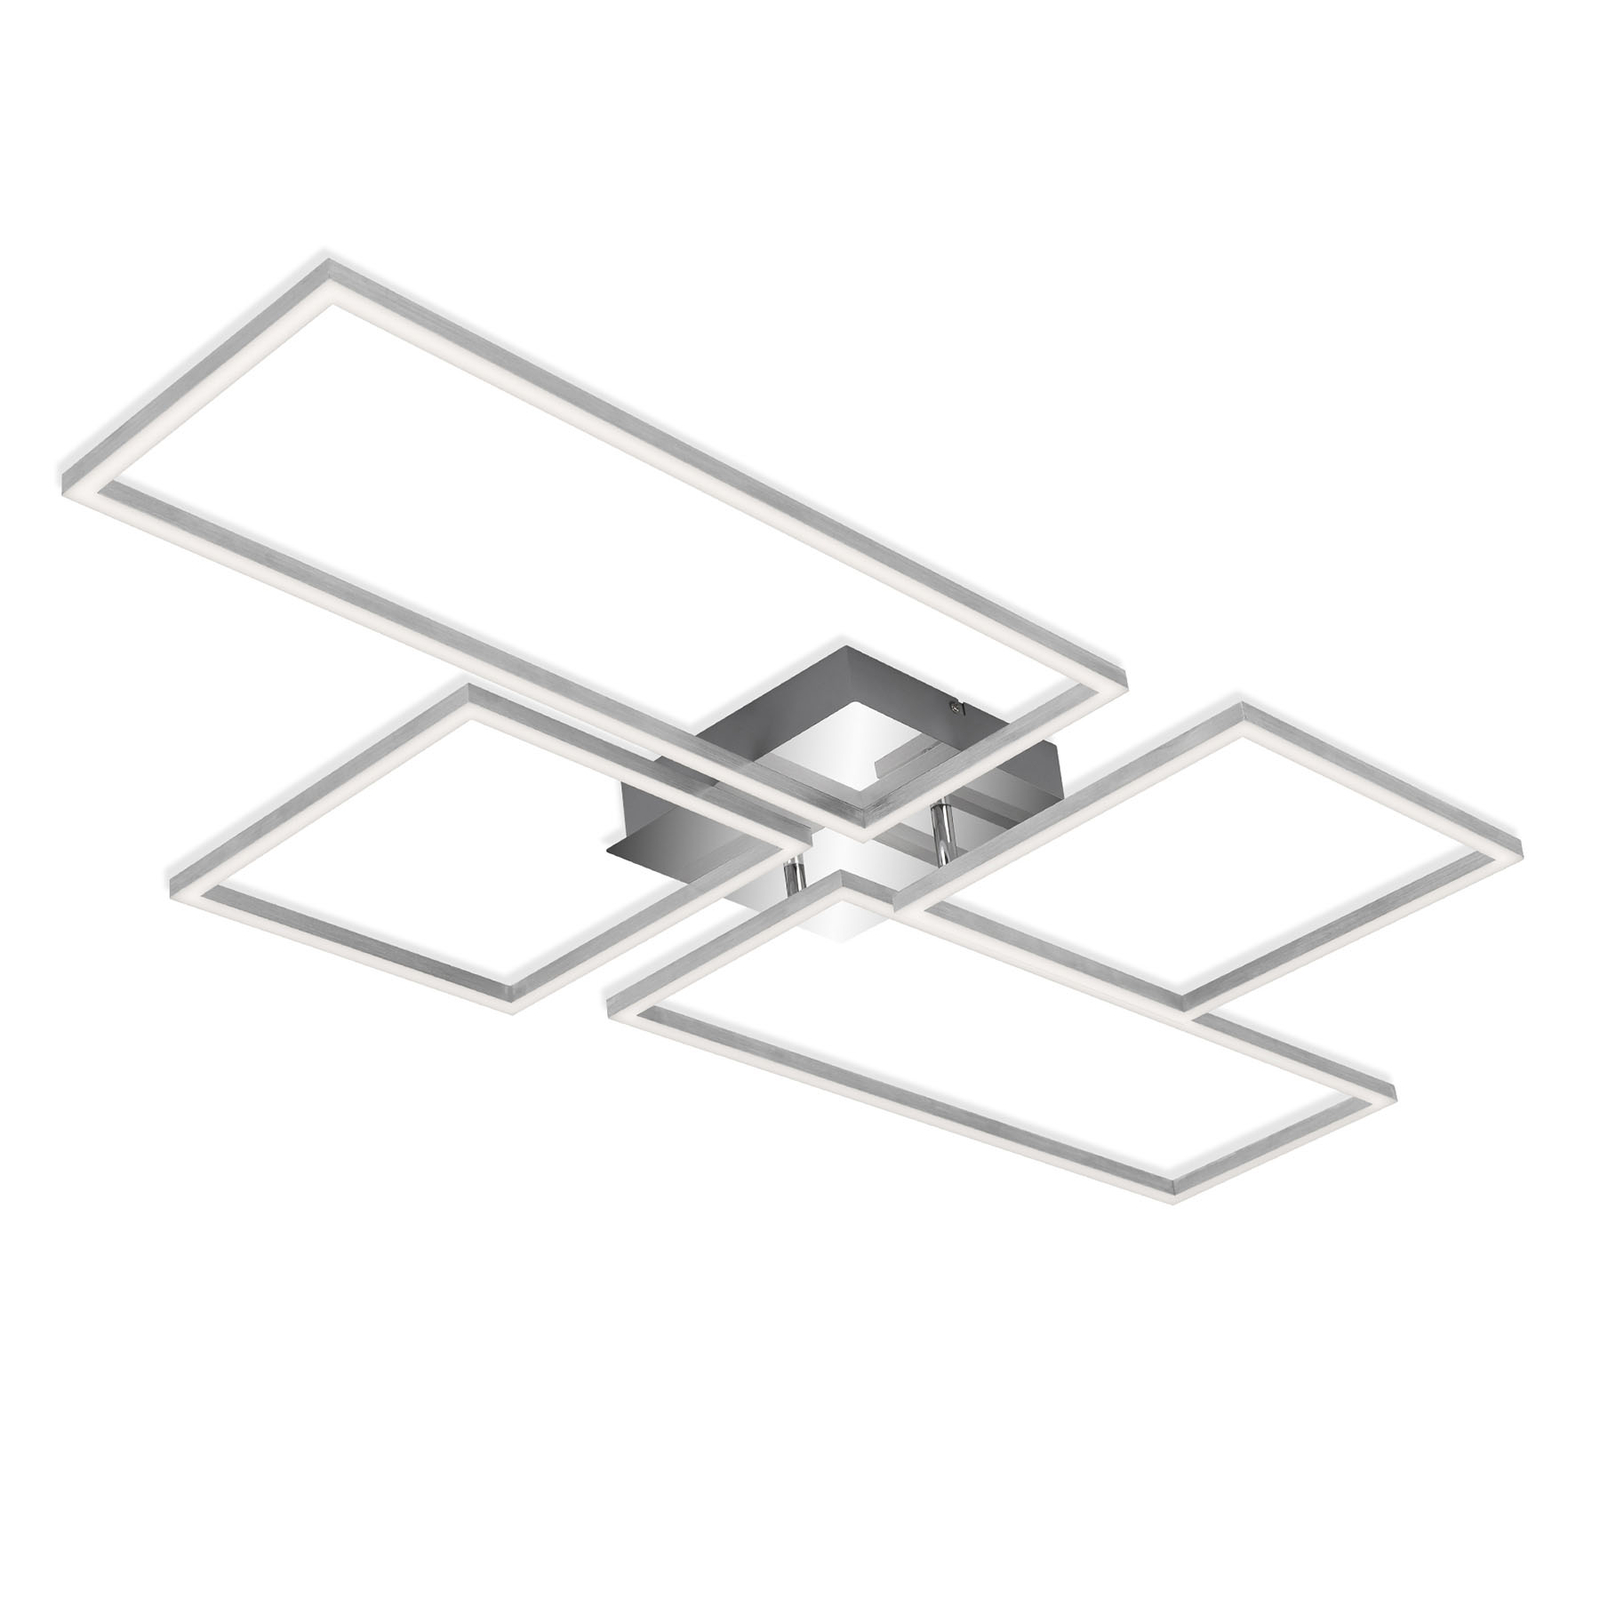 Lampa sufitowa LED Frame CCT, chromowa, 110x54cm